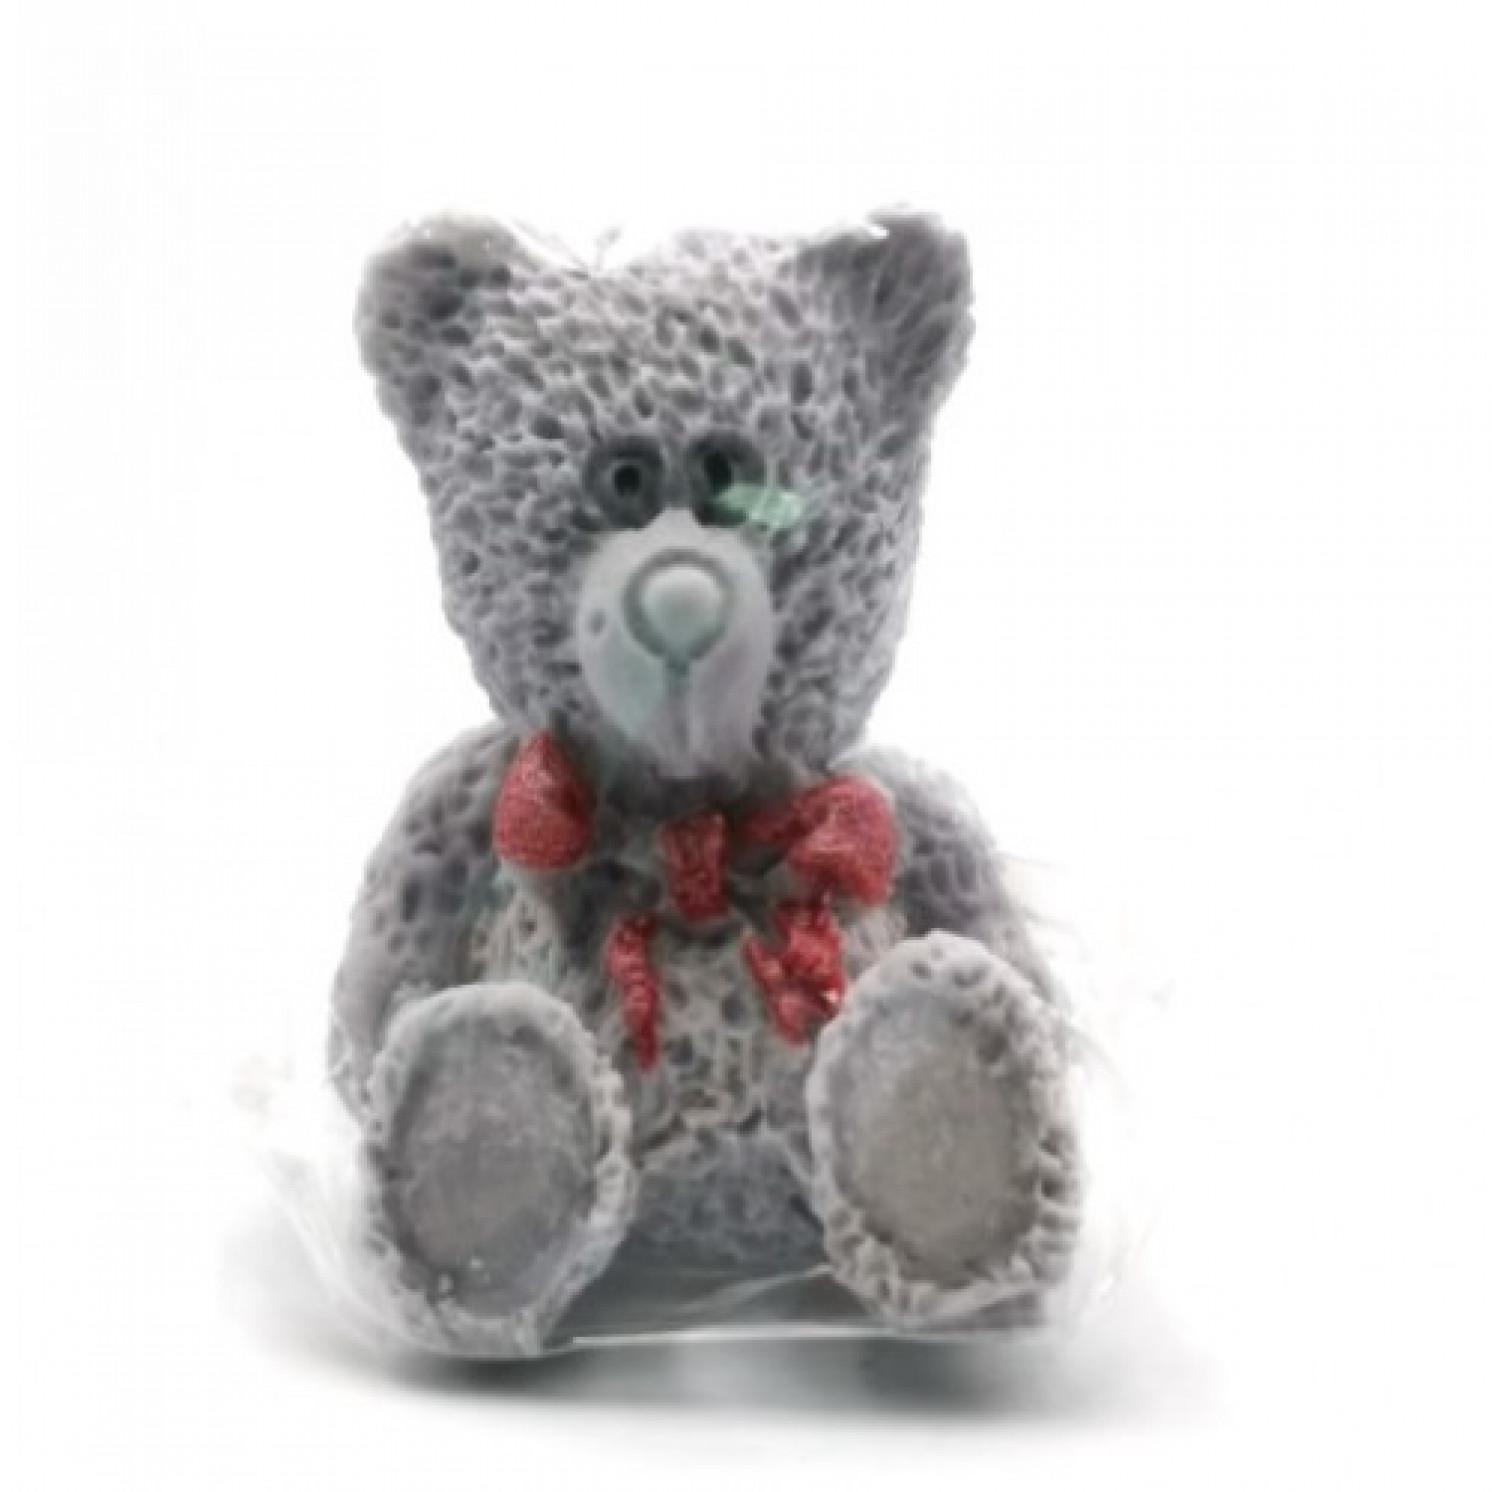 Сахарные фигурки Медвежонок серый, 40*40*50 мм